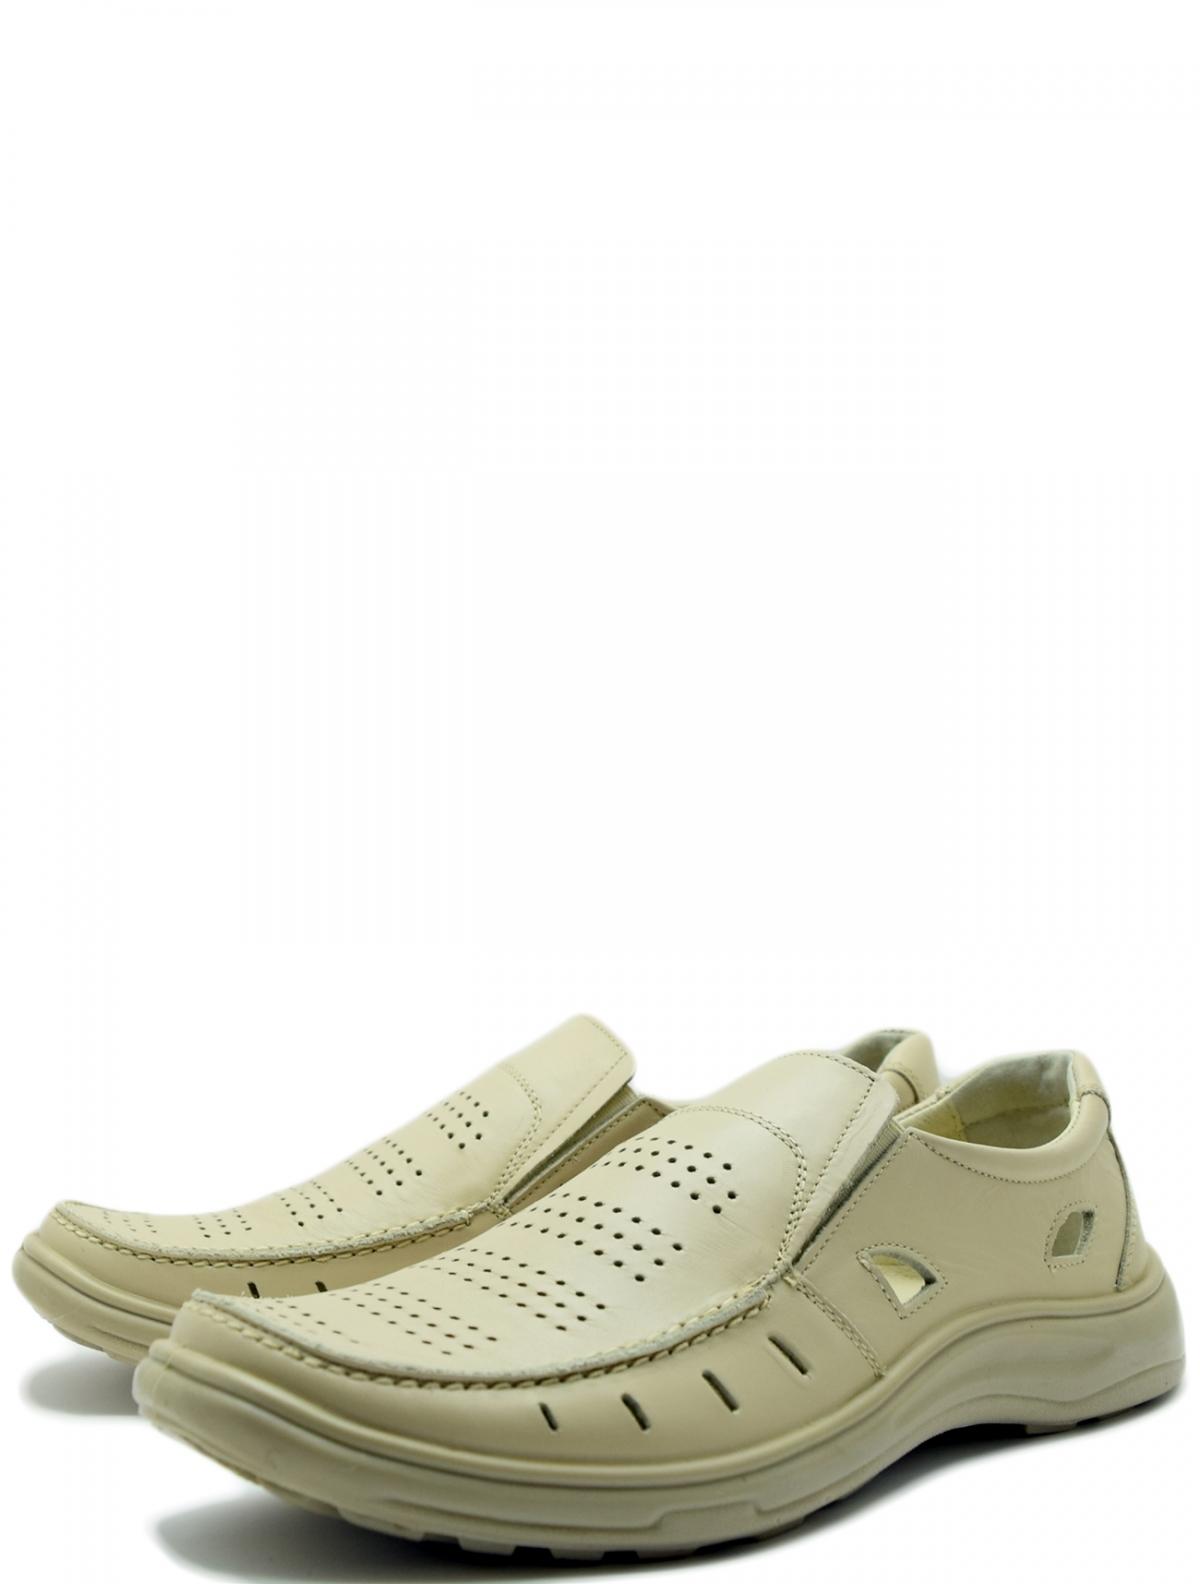 Marko 4441 мужские туфли